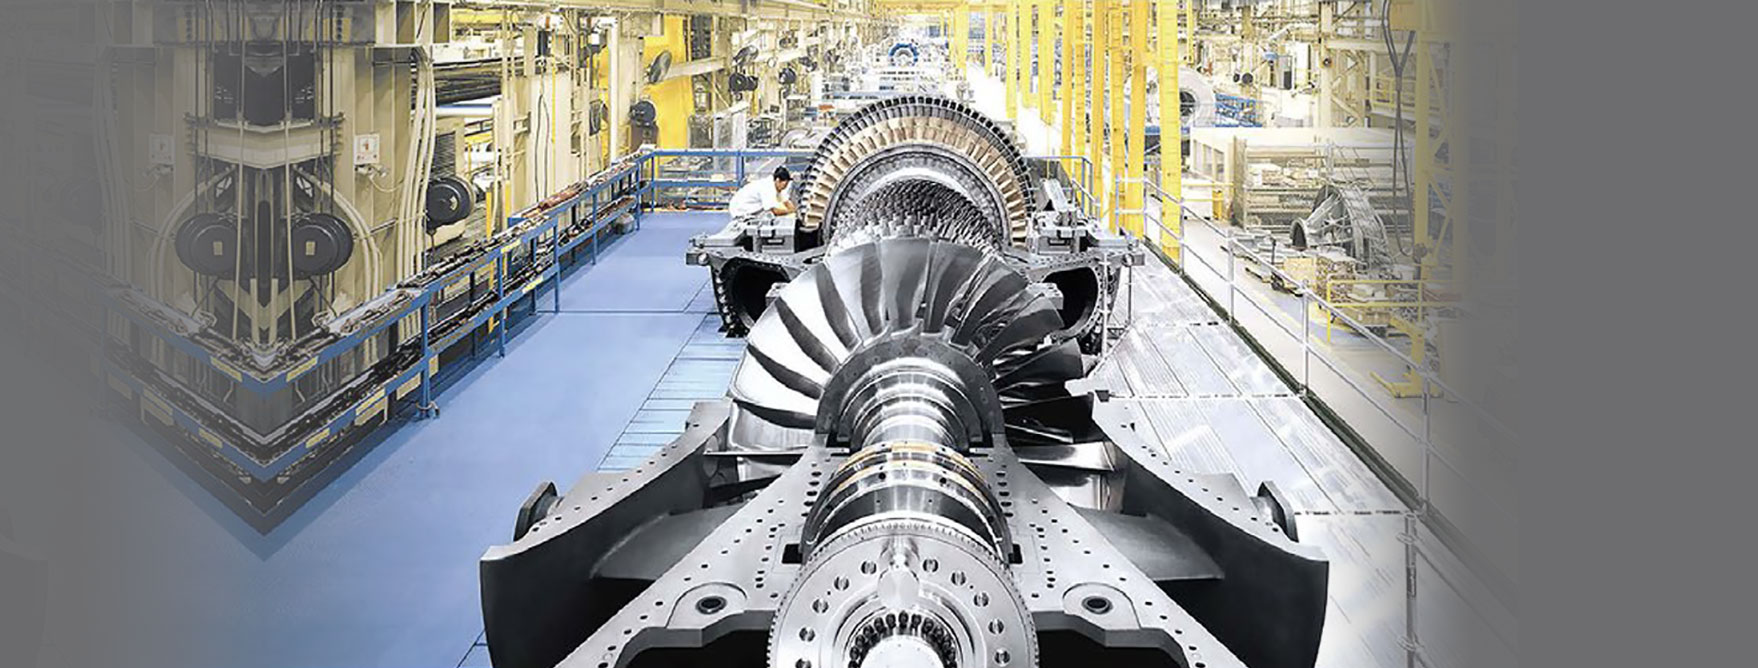 Energy Management Solution - Gas Turbine